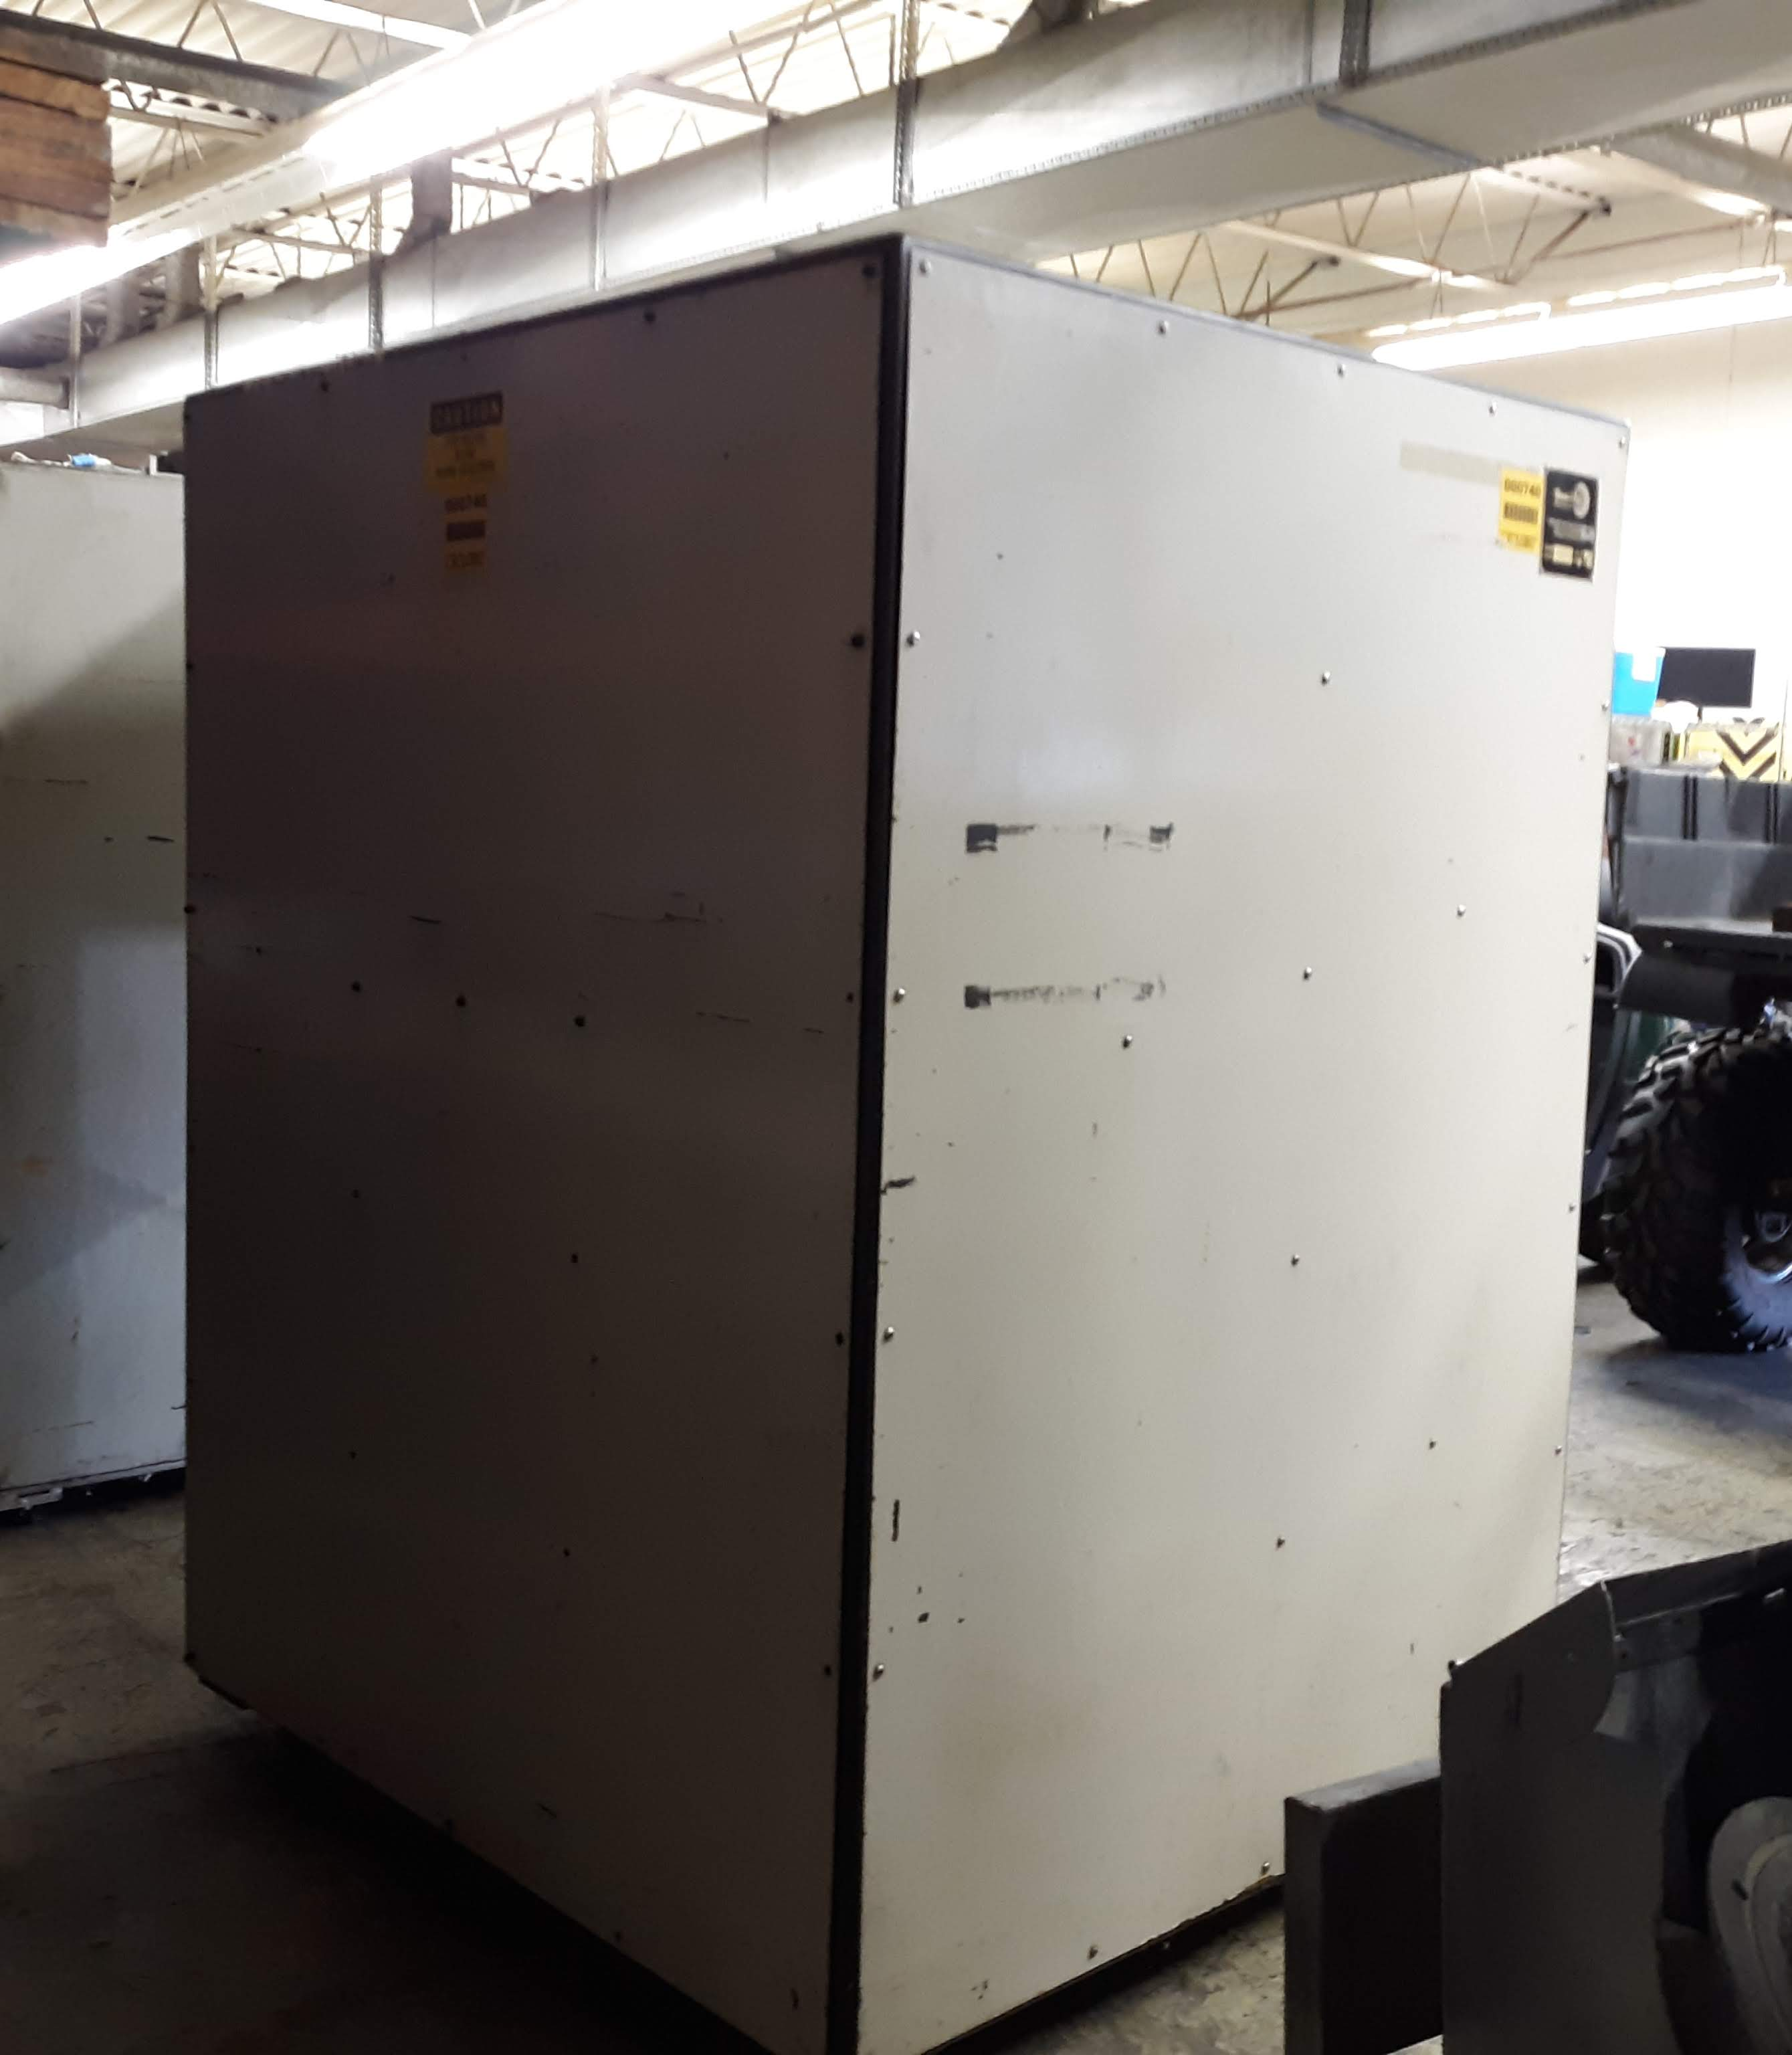 Lot 1236 - GRAV-I-FLO GYRA FINISH CENTRIFUGAL BARREL FINISHING MACHINE MODEL-C-4806 S#173 460V/3PH/60HZ (